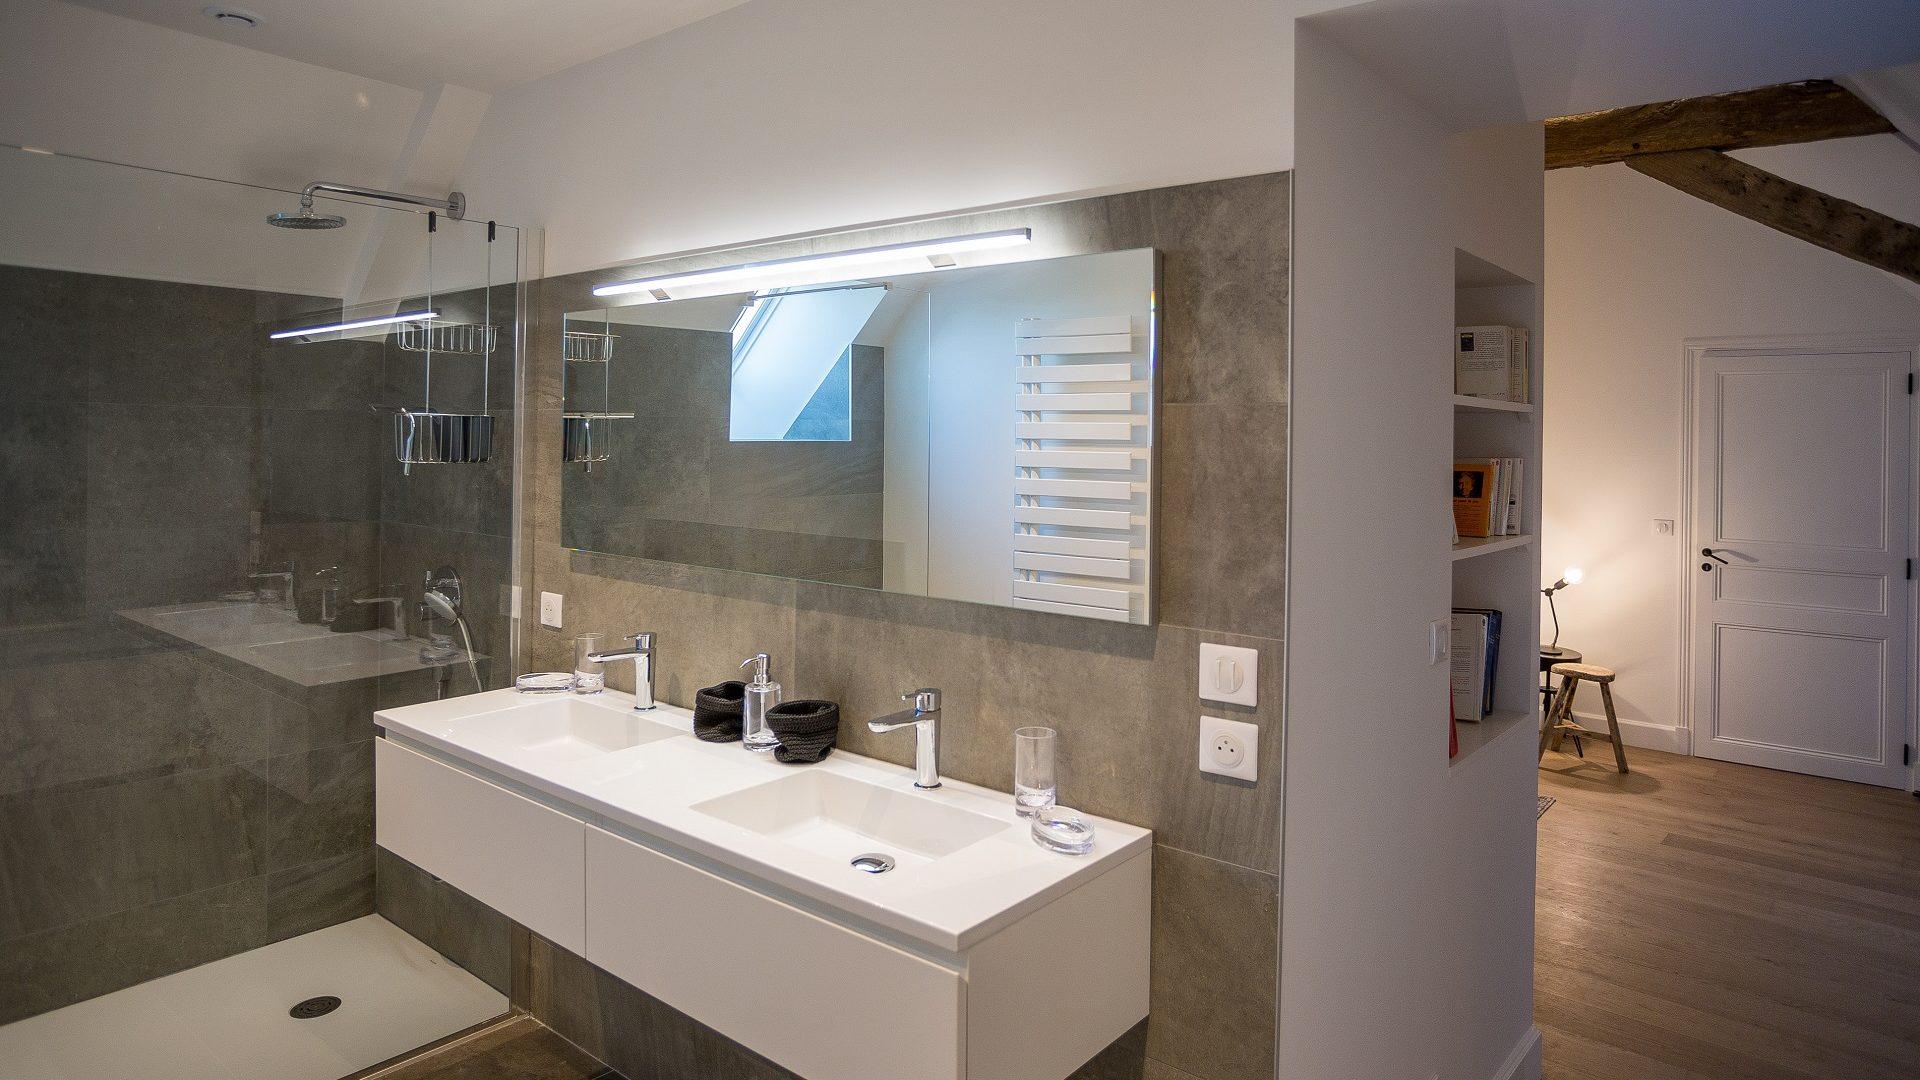 1104 - ch pierre de tuffeau  SdB meuble+douche+vue chambre IMGL1104